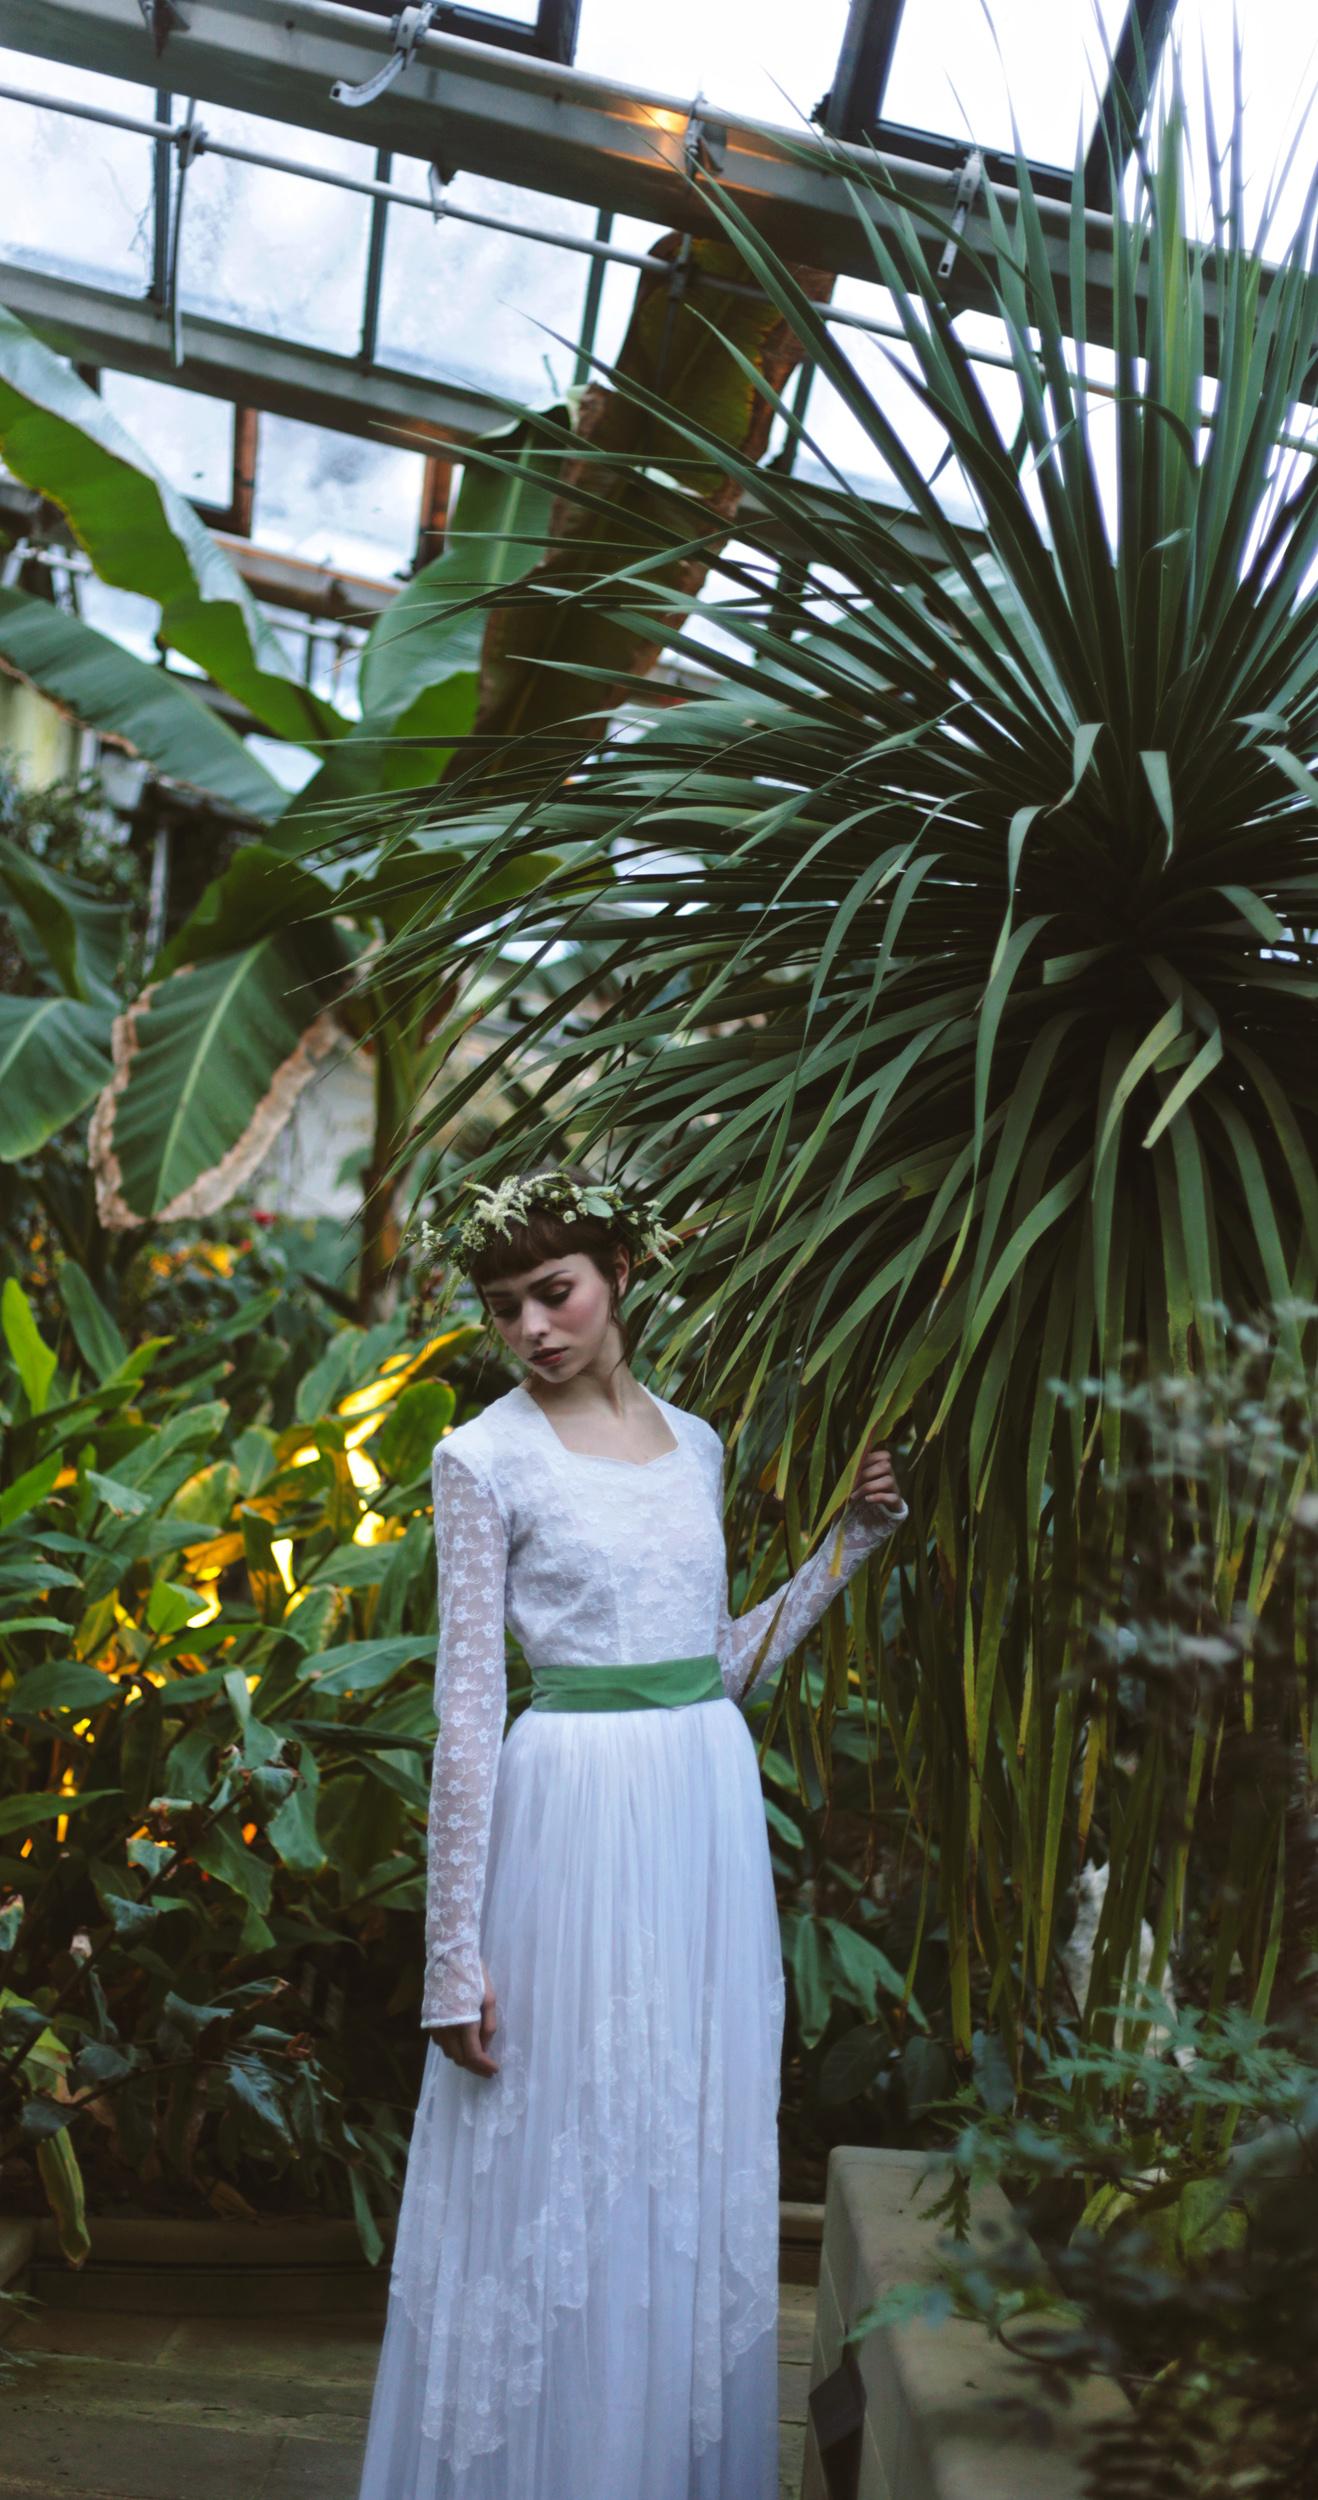 Winter-Bridal-Kate-Beaumont-Shelley-Richmond-Vintage-Wedding-Dress-24.jpg